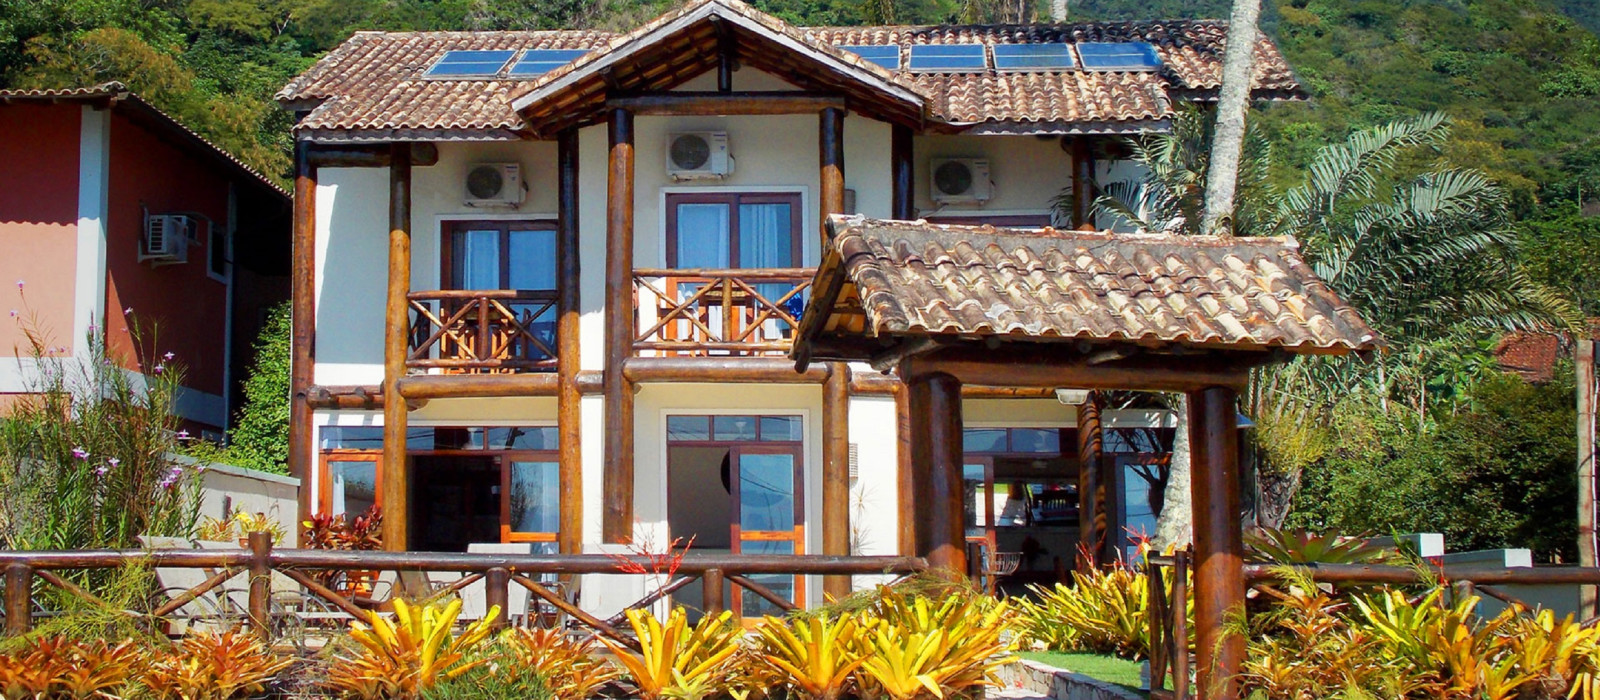 Hotel Caiçara Pousada Brazil